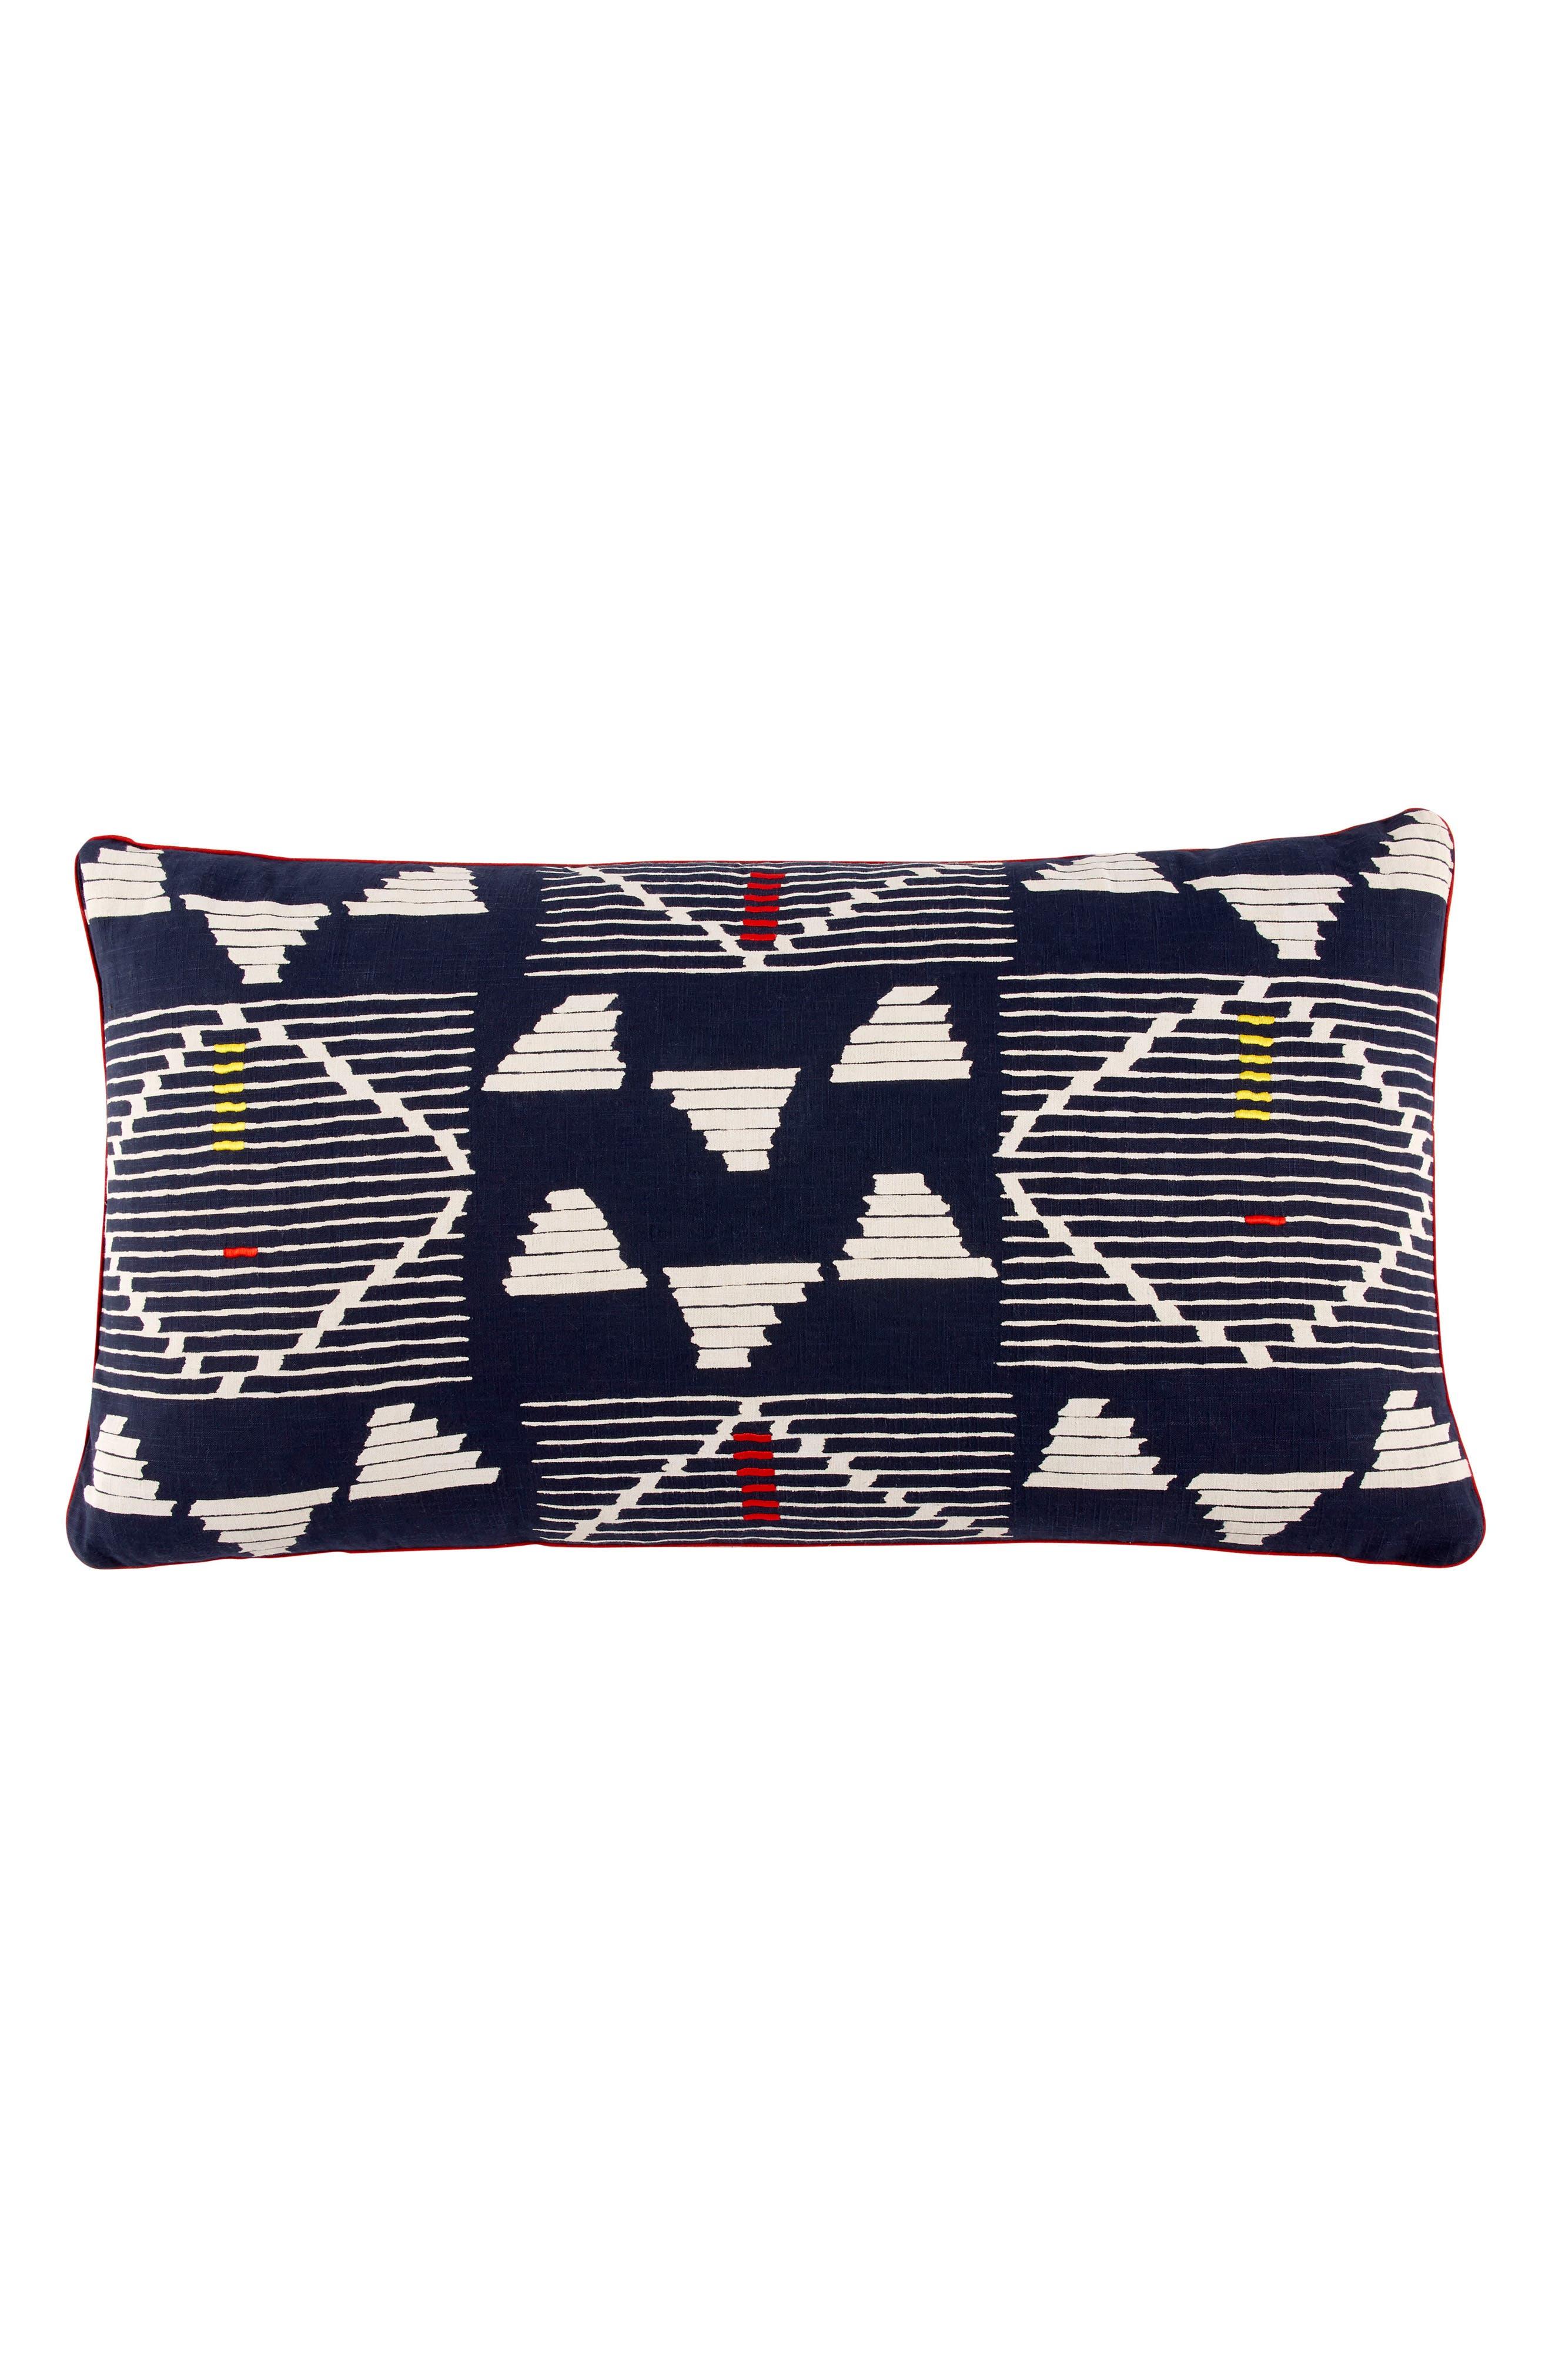 Kambu Bolster Decorative Pillow,                             Main thumbnail 1, color,                             410